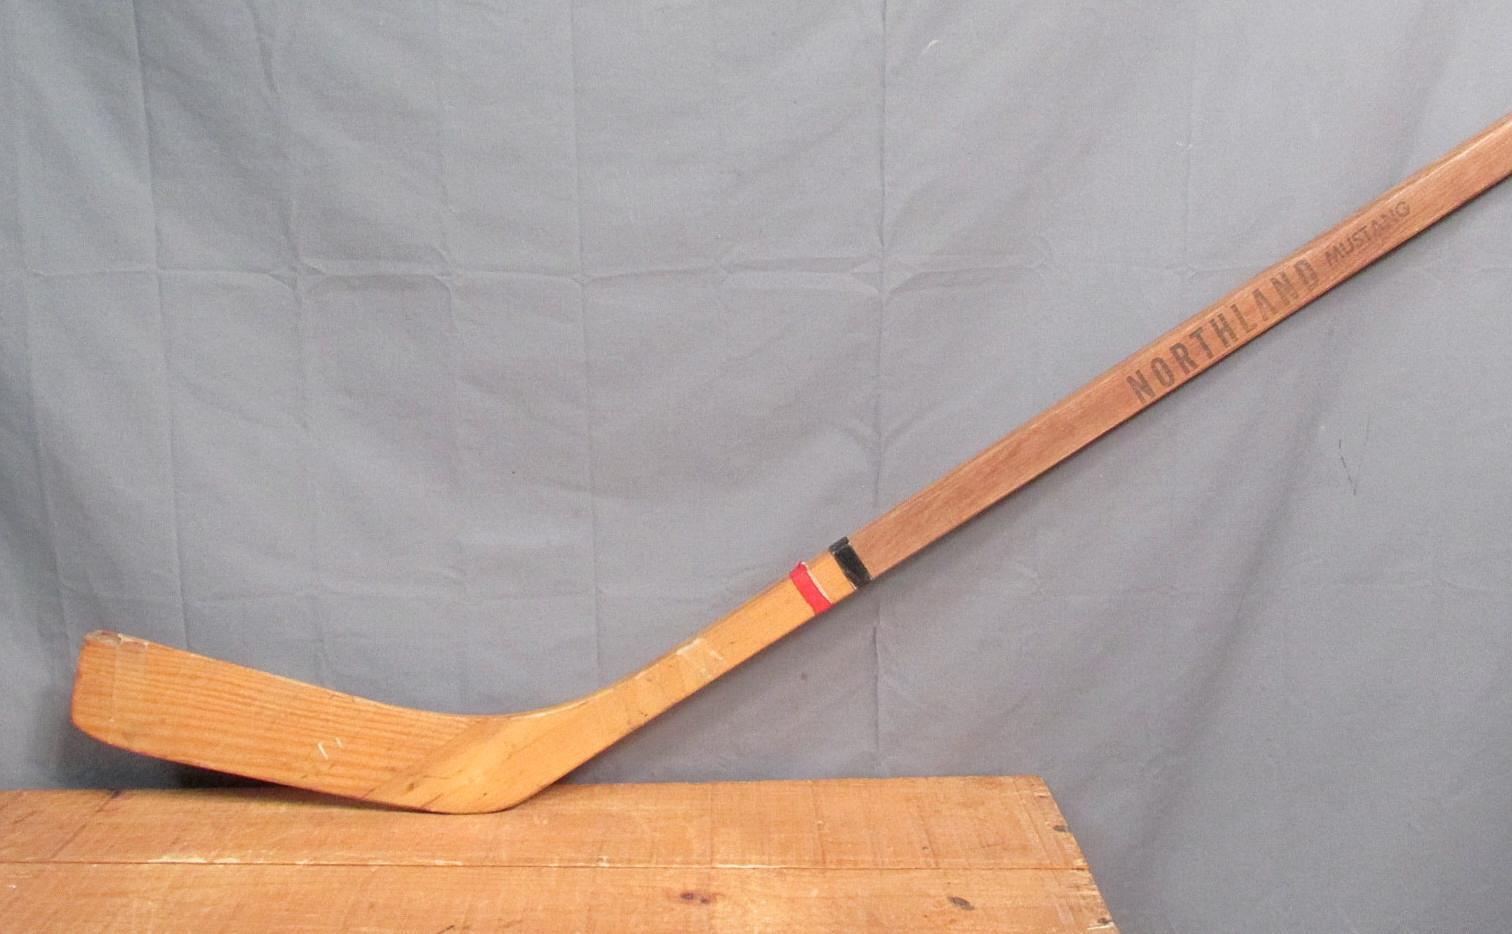 Antique Hockey Stick - Best 2000+ Antique decor ideas